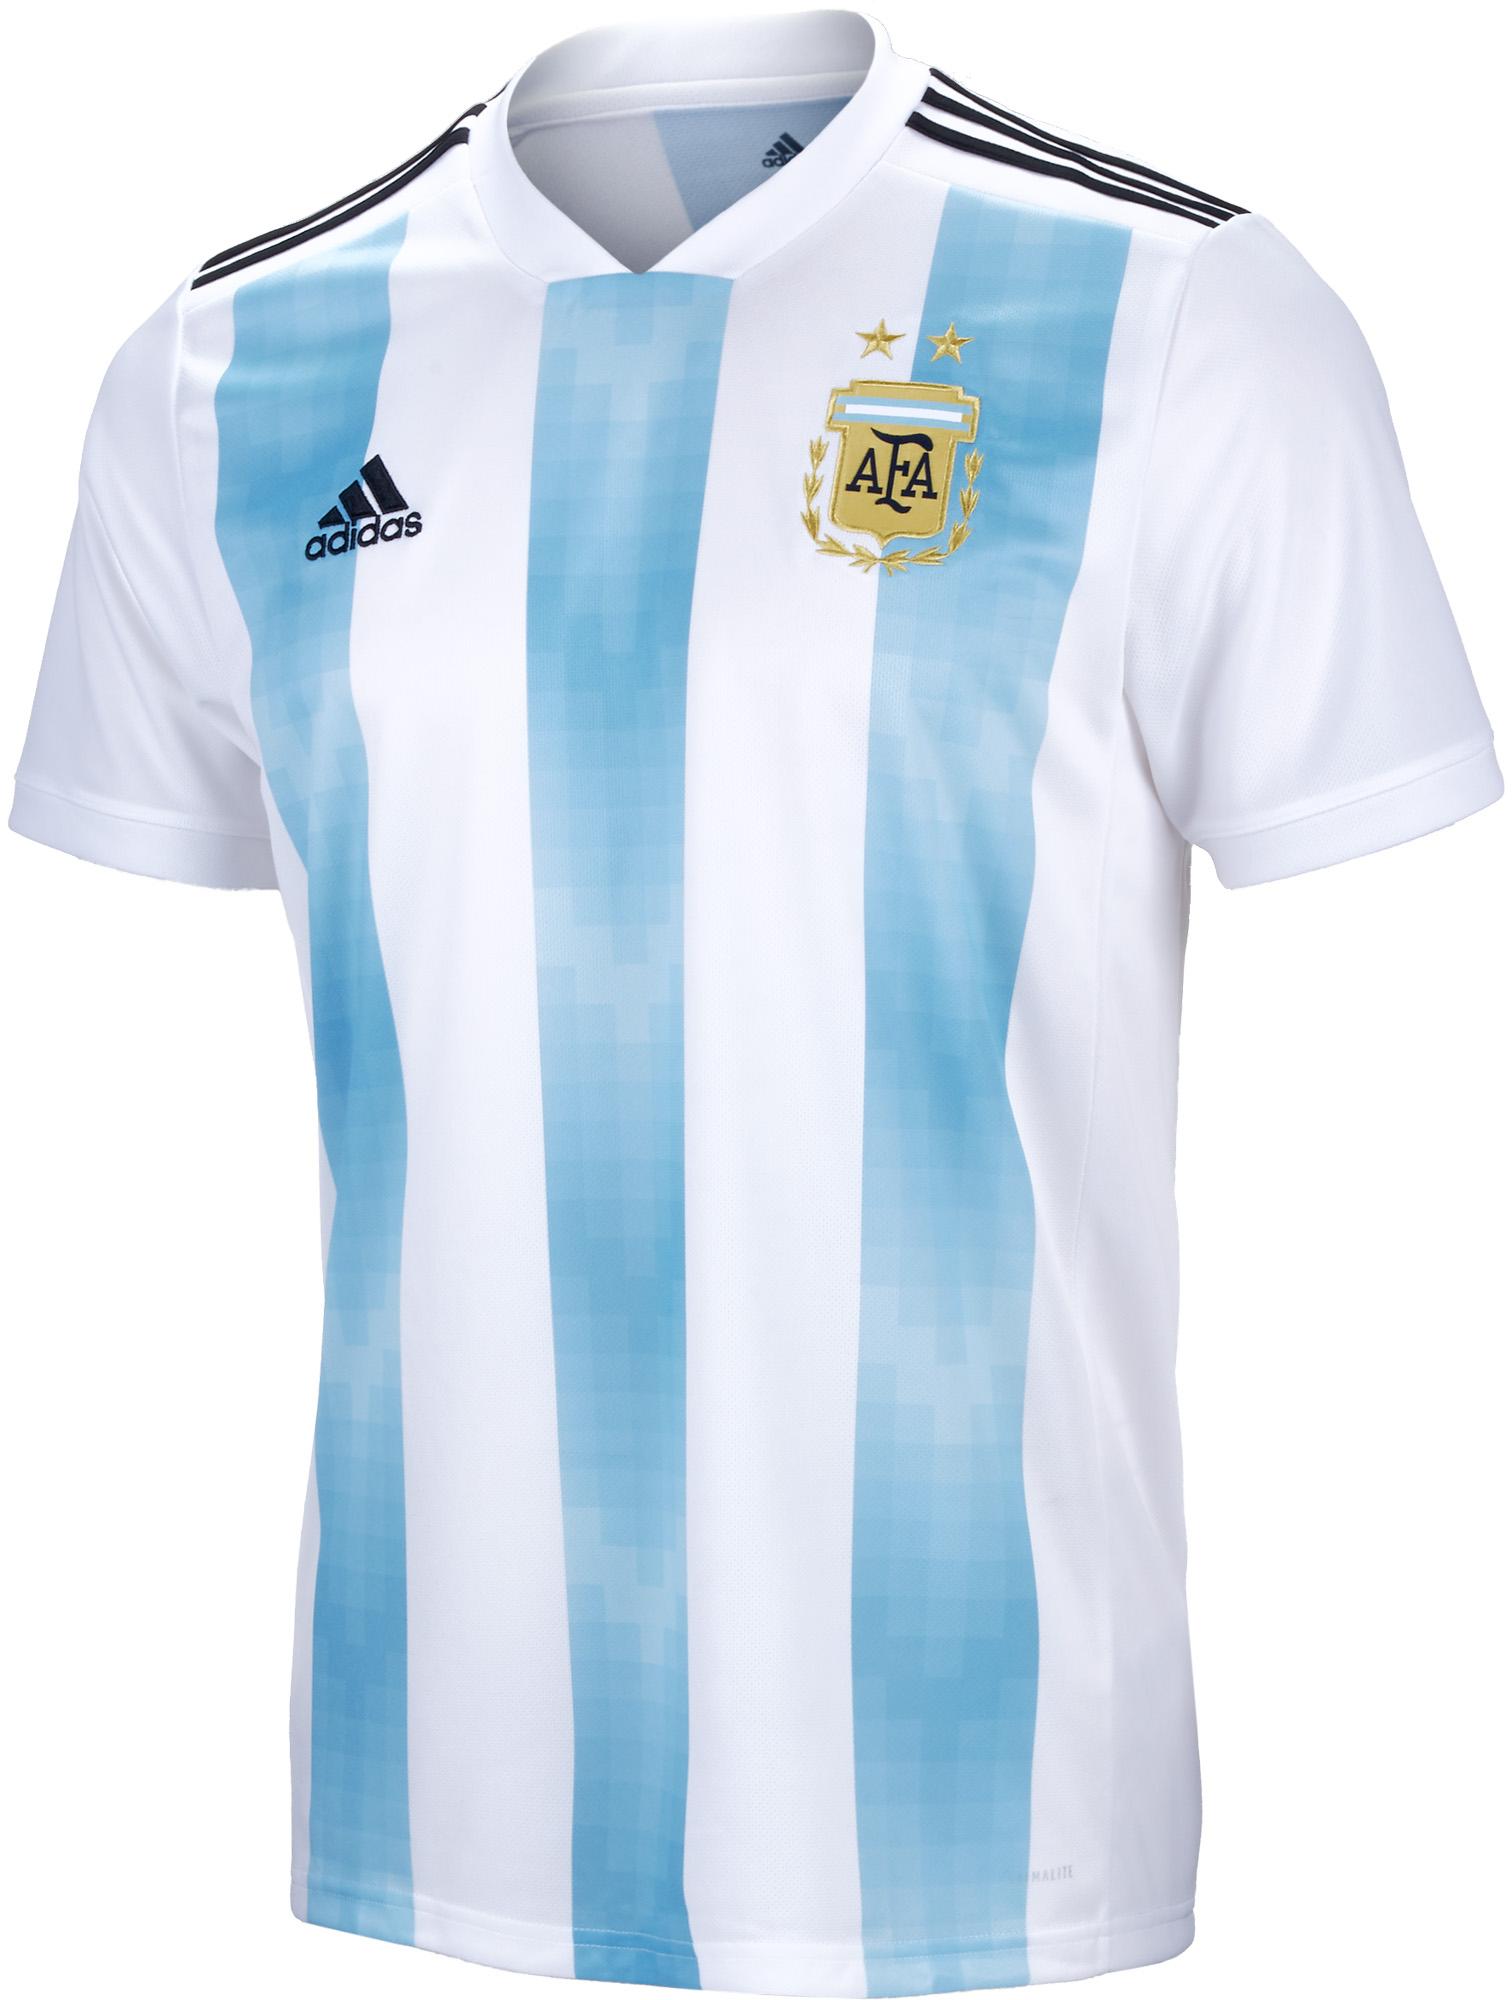 cdc140a1027 adidas Kids Argentina Home Jersey 2018-19 - Soccer Master